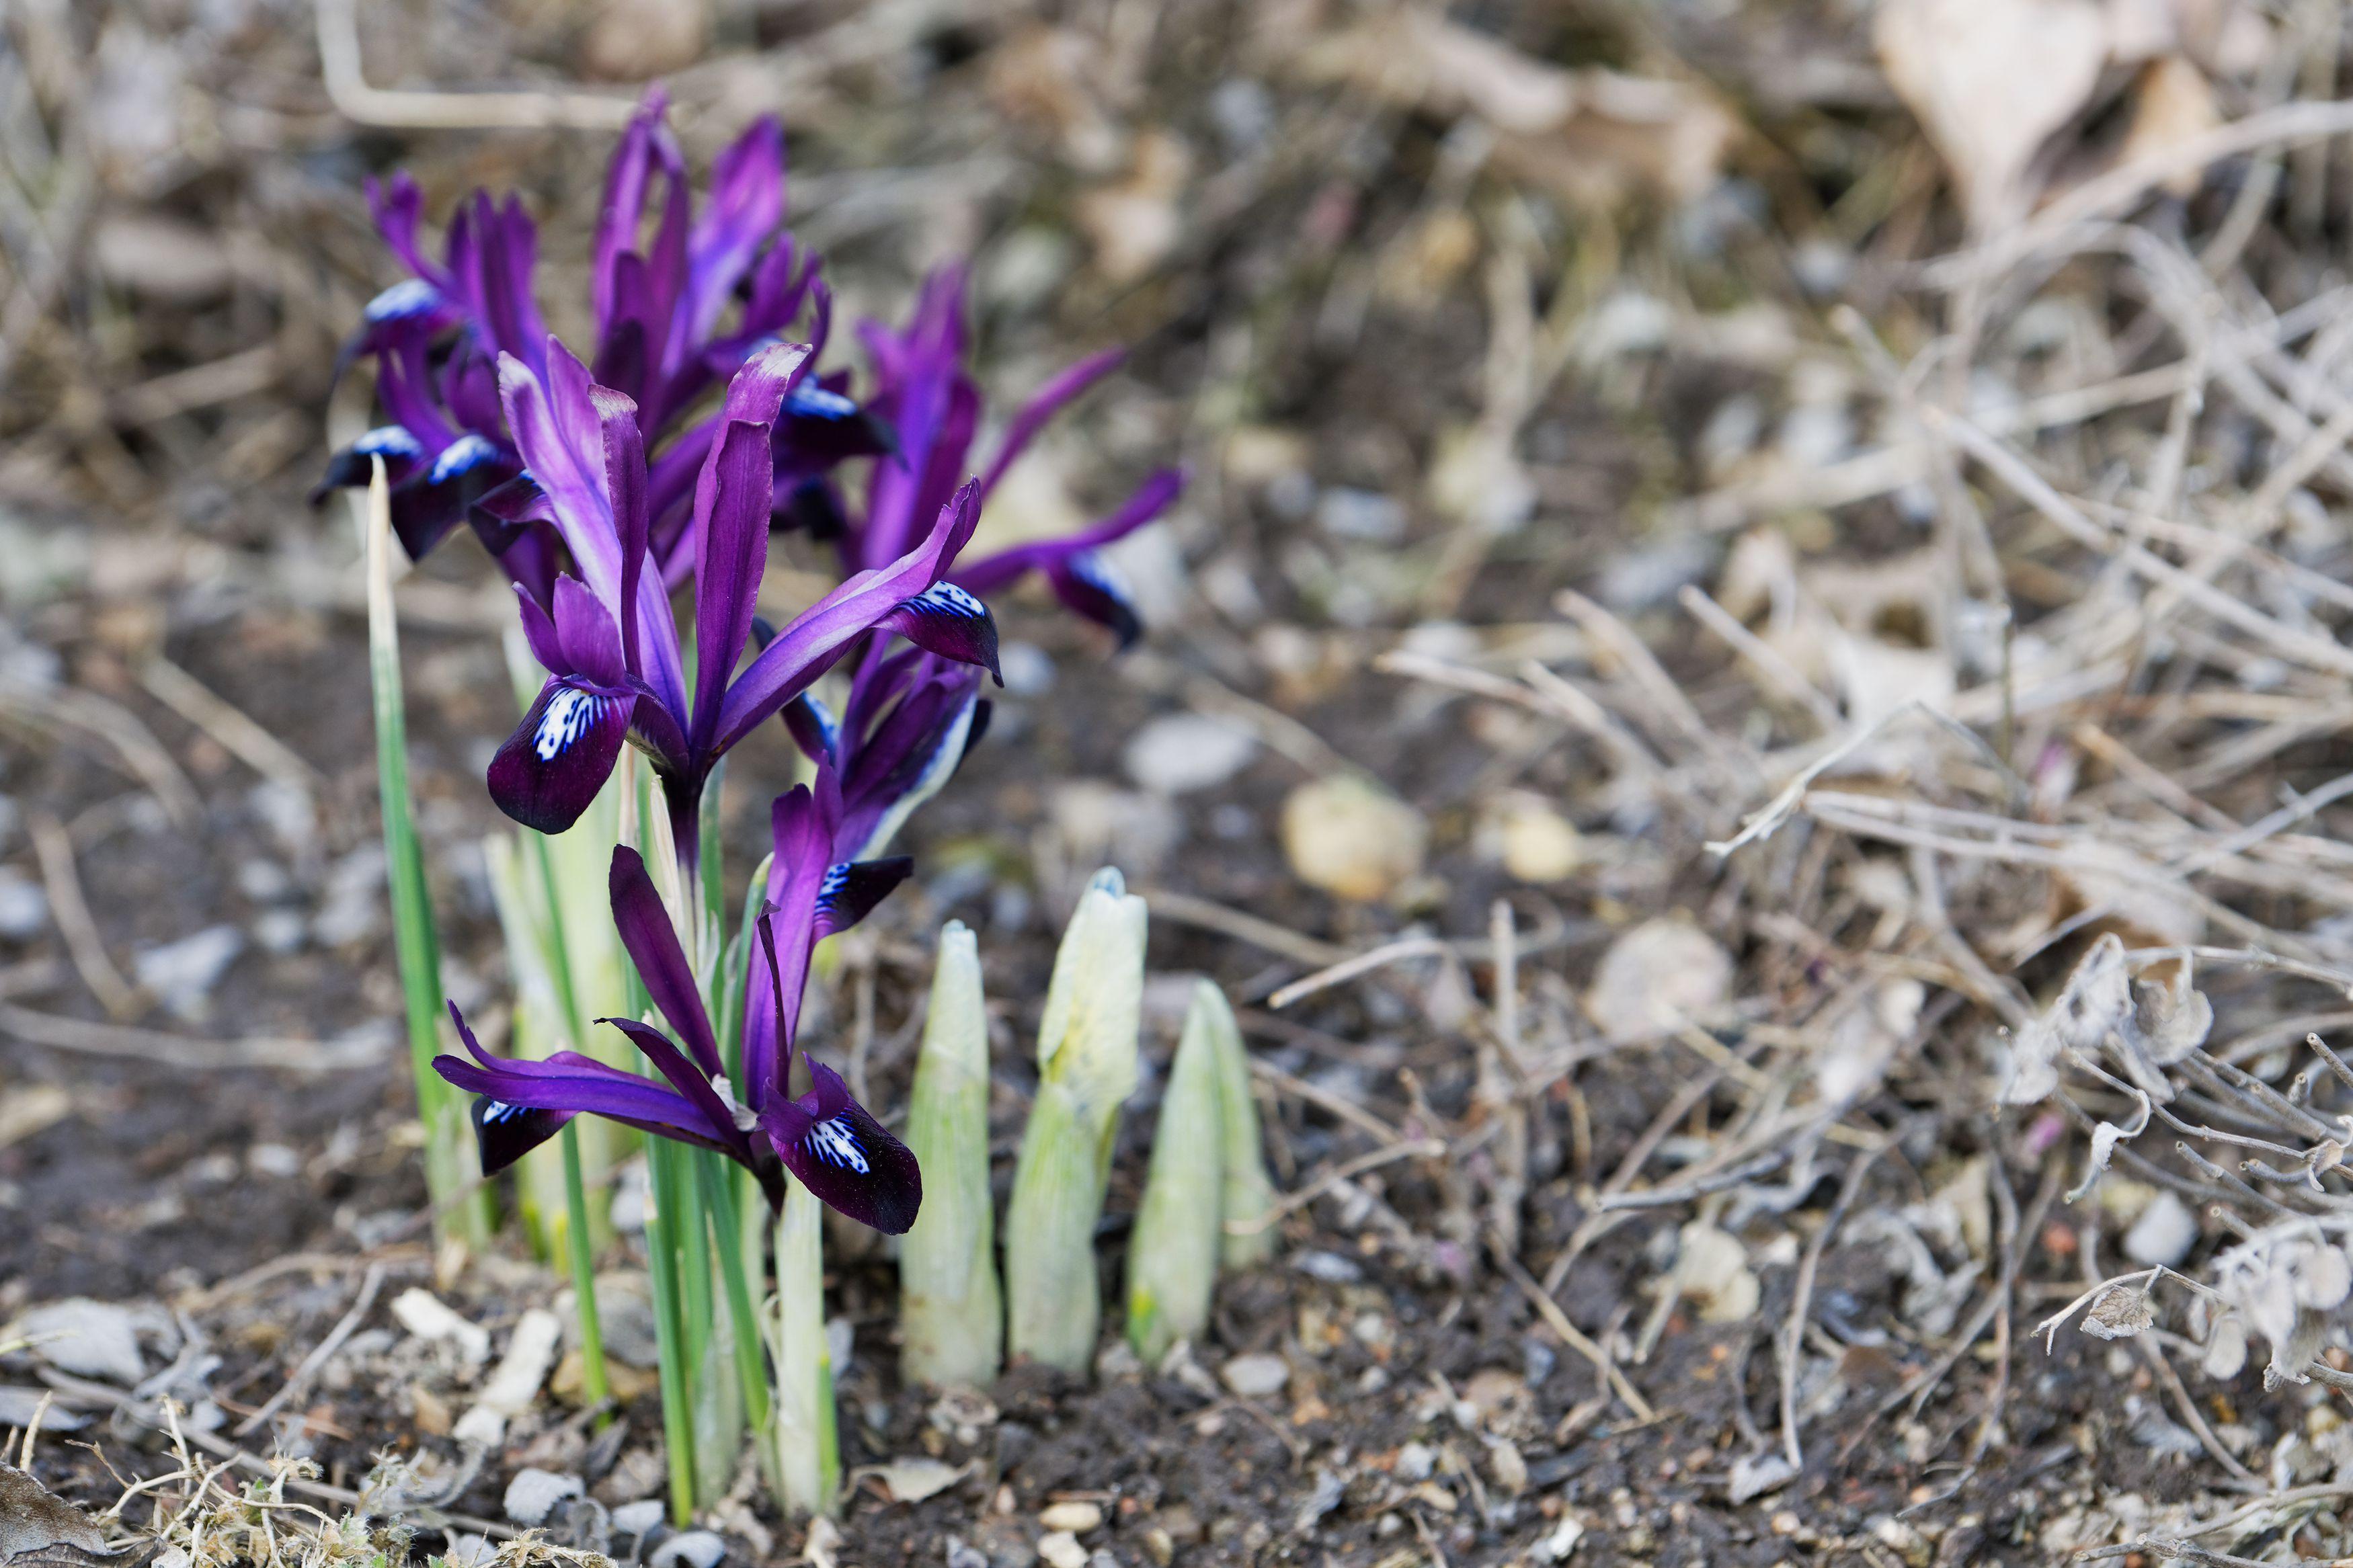 Reticulated irises in bloom.